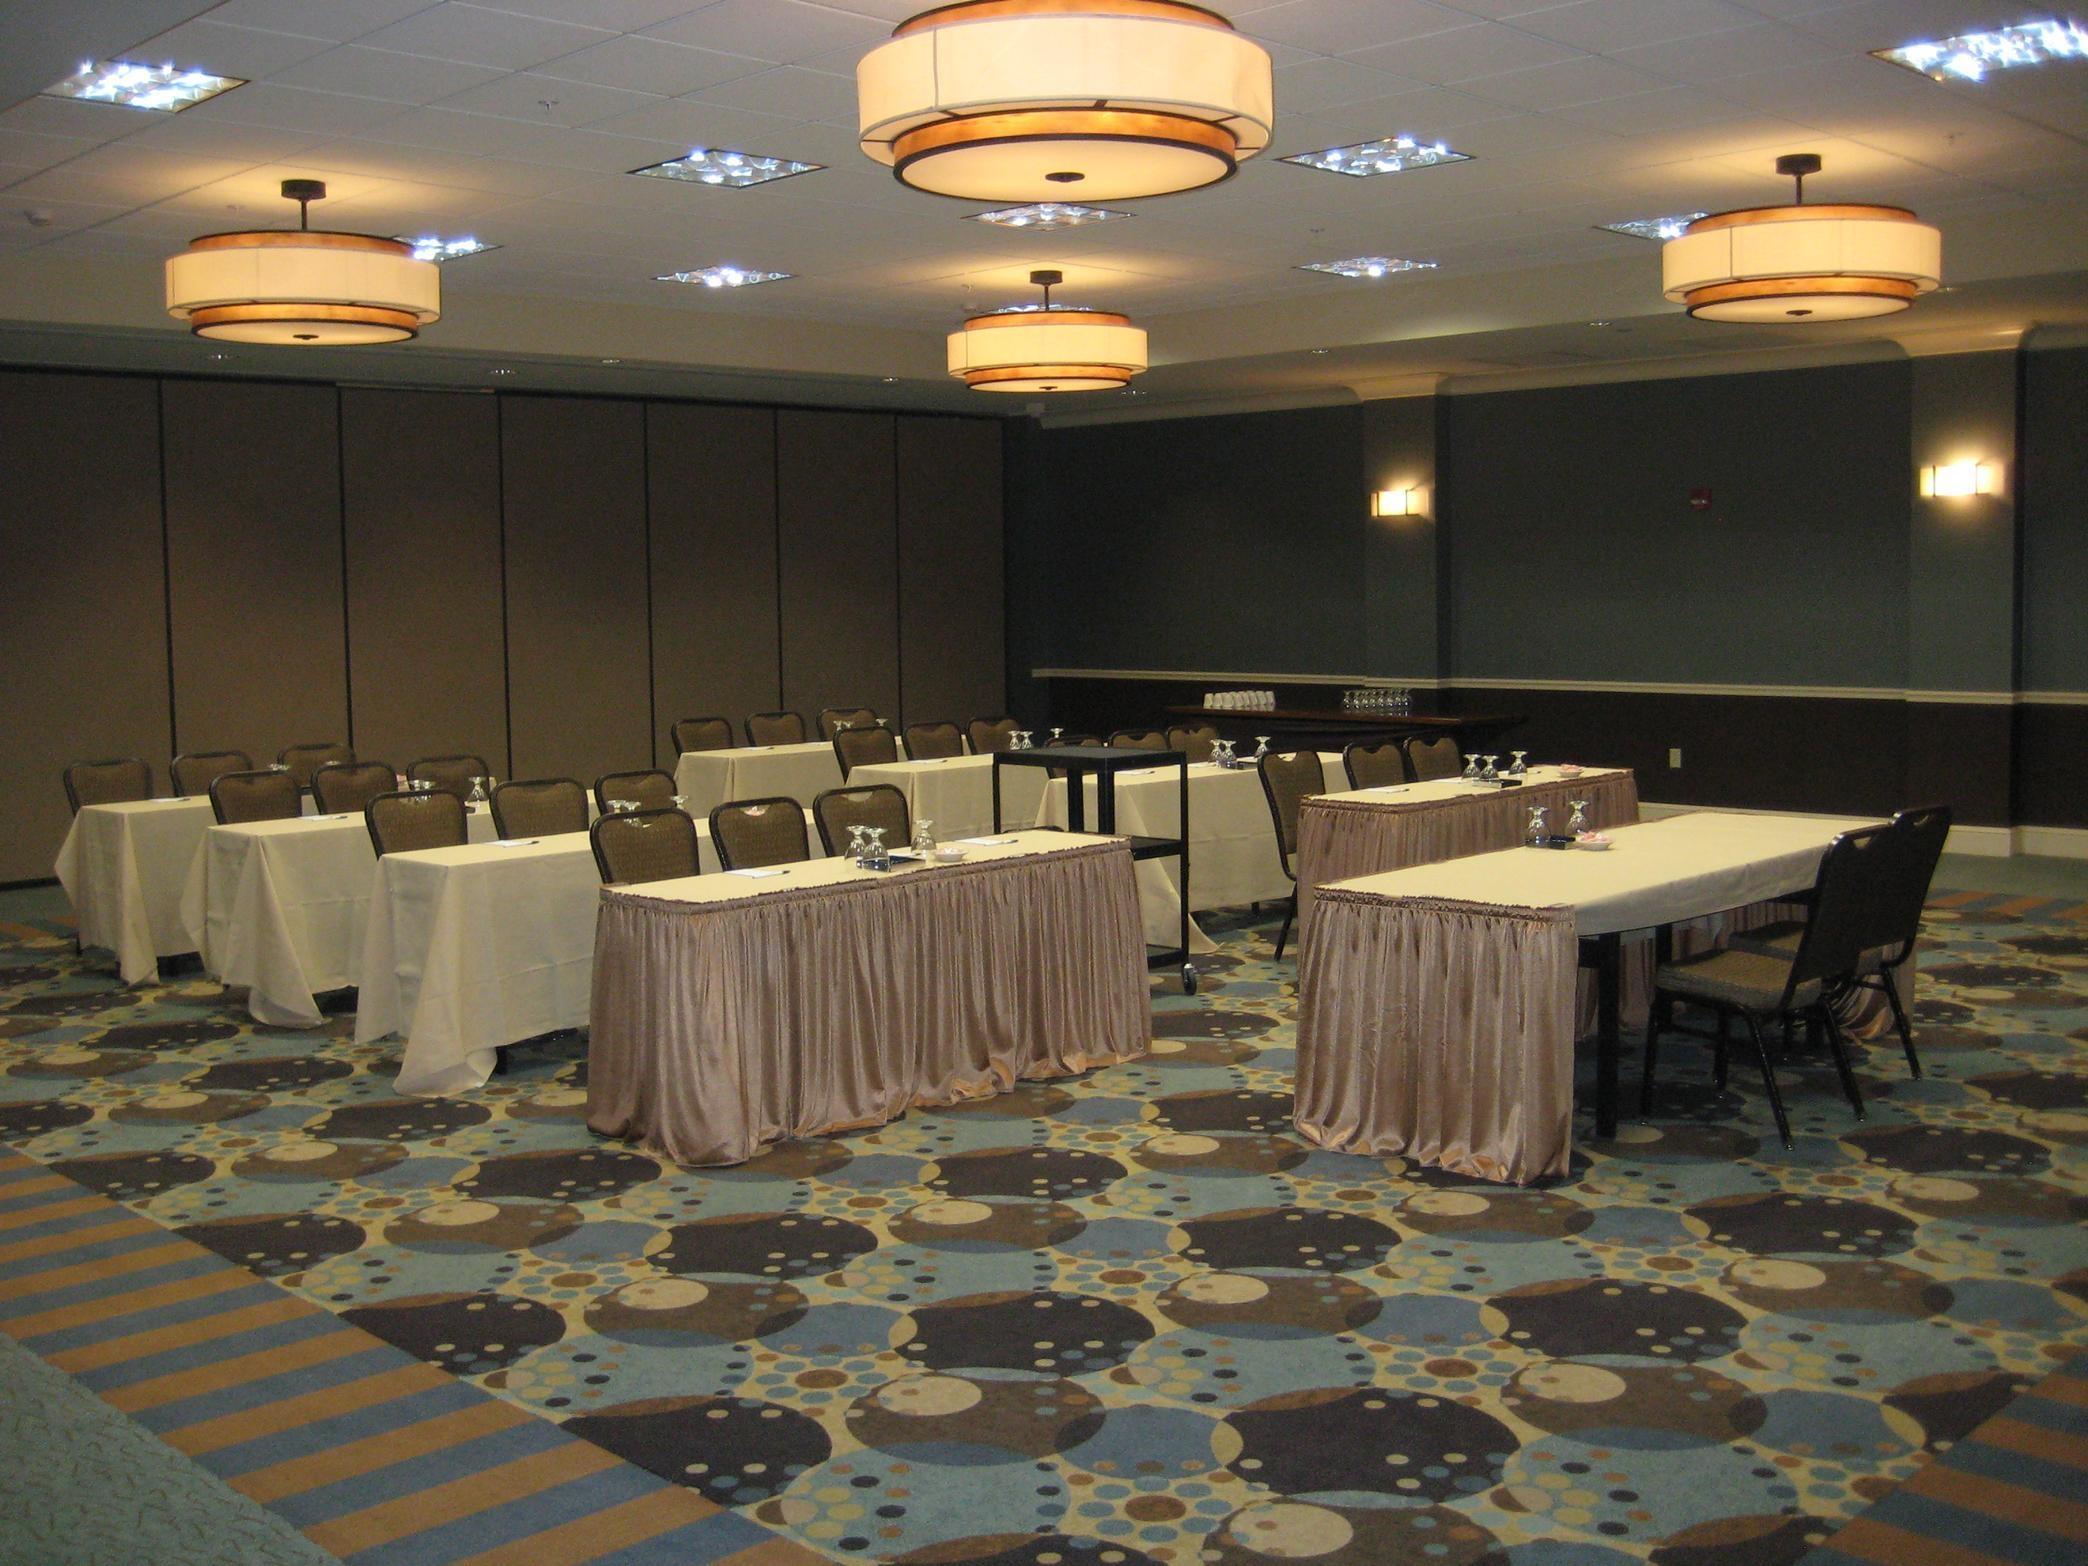 Hilton Garden Inn Omaha East Council Bluffs Council Bluffs Iowa Ia